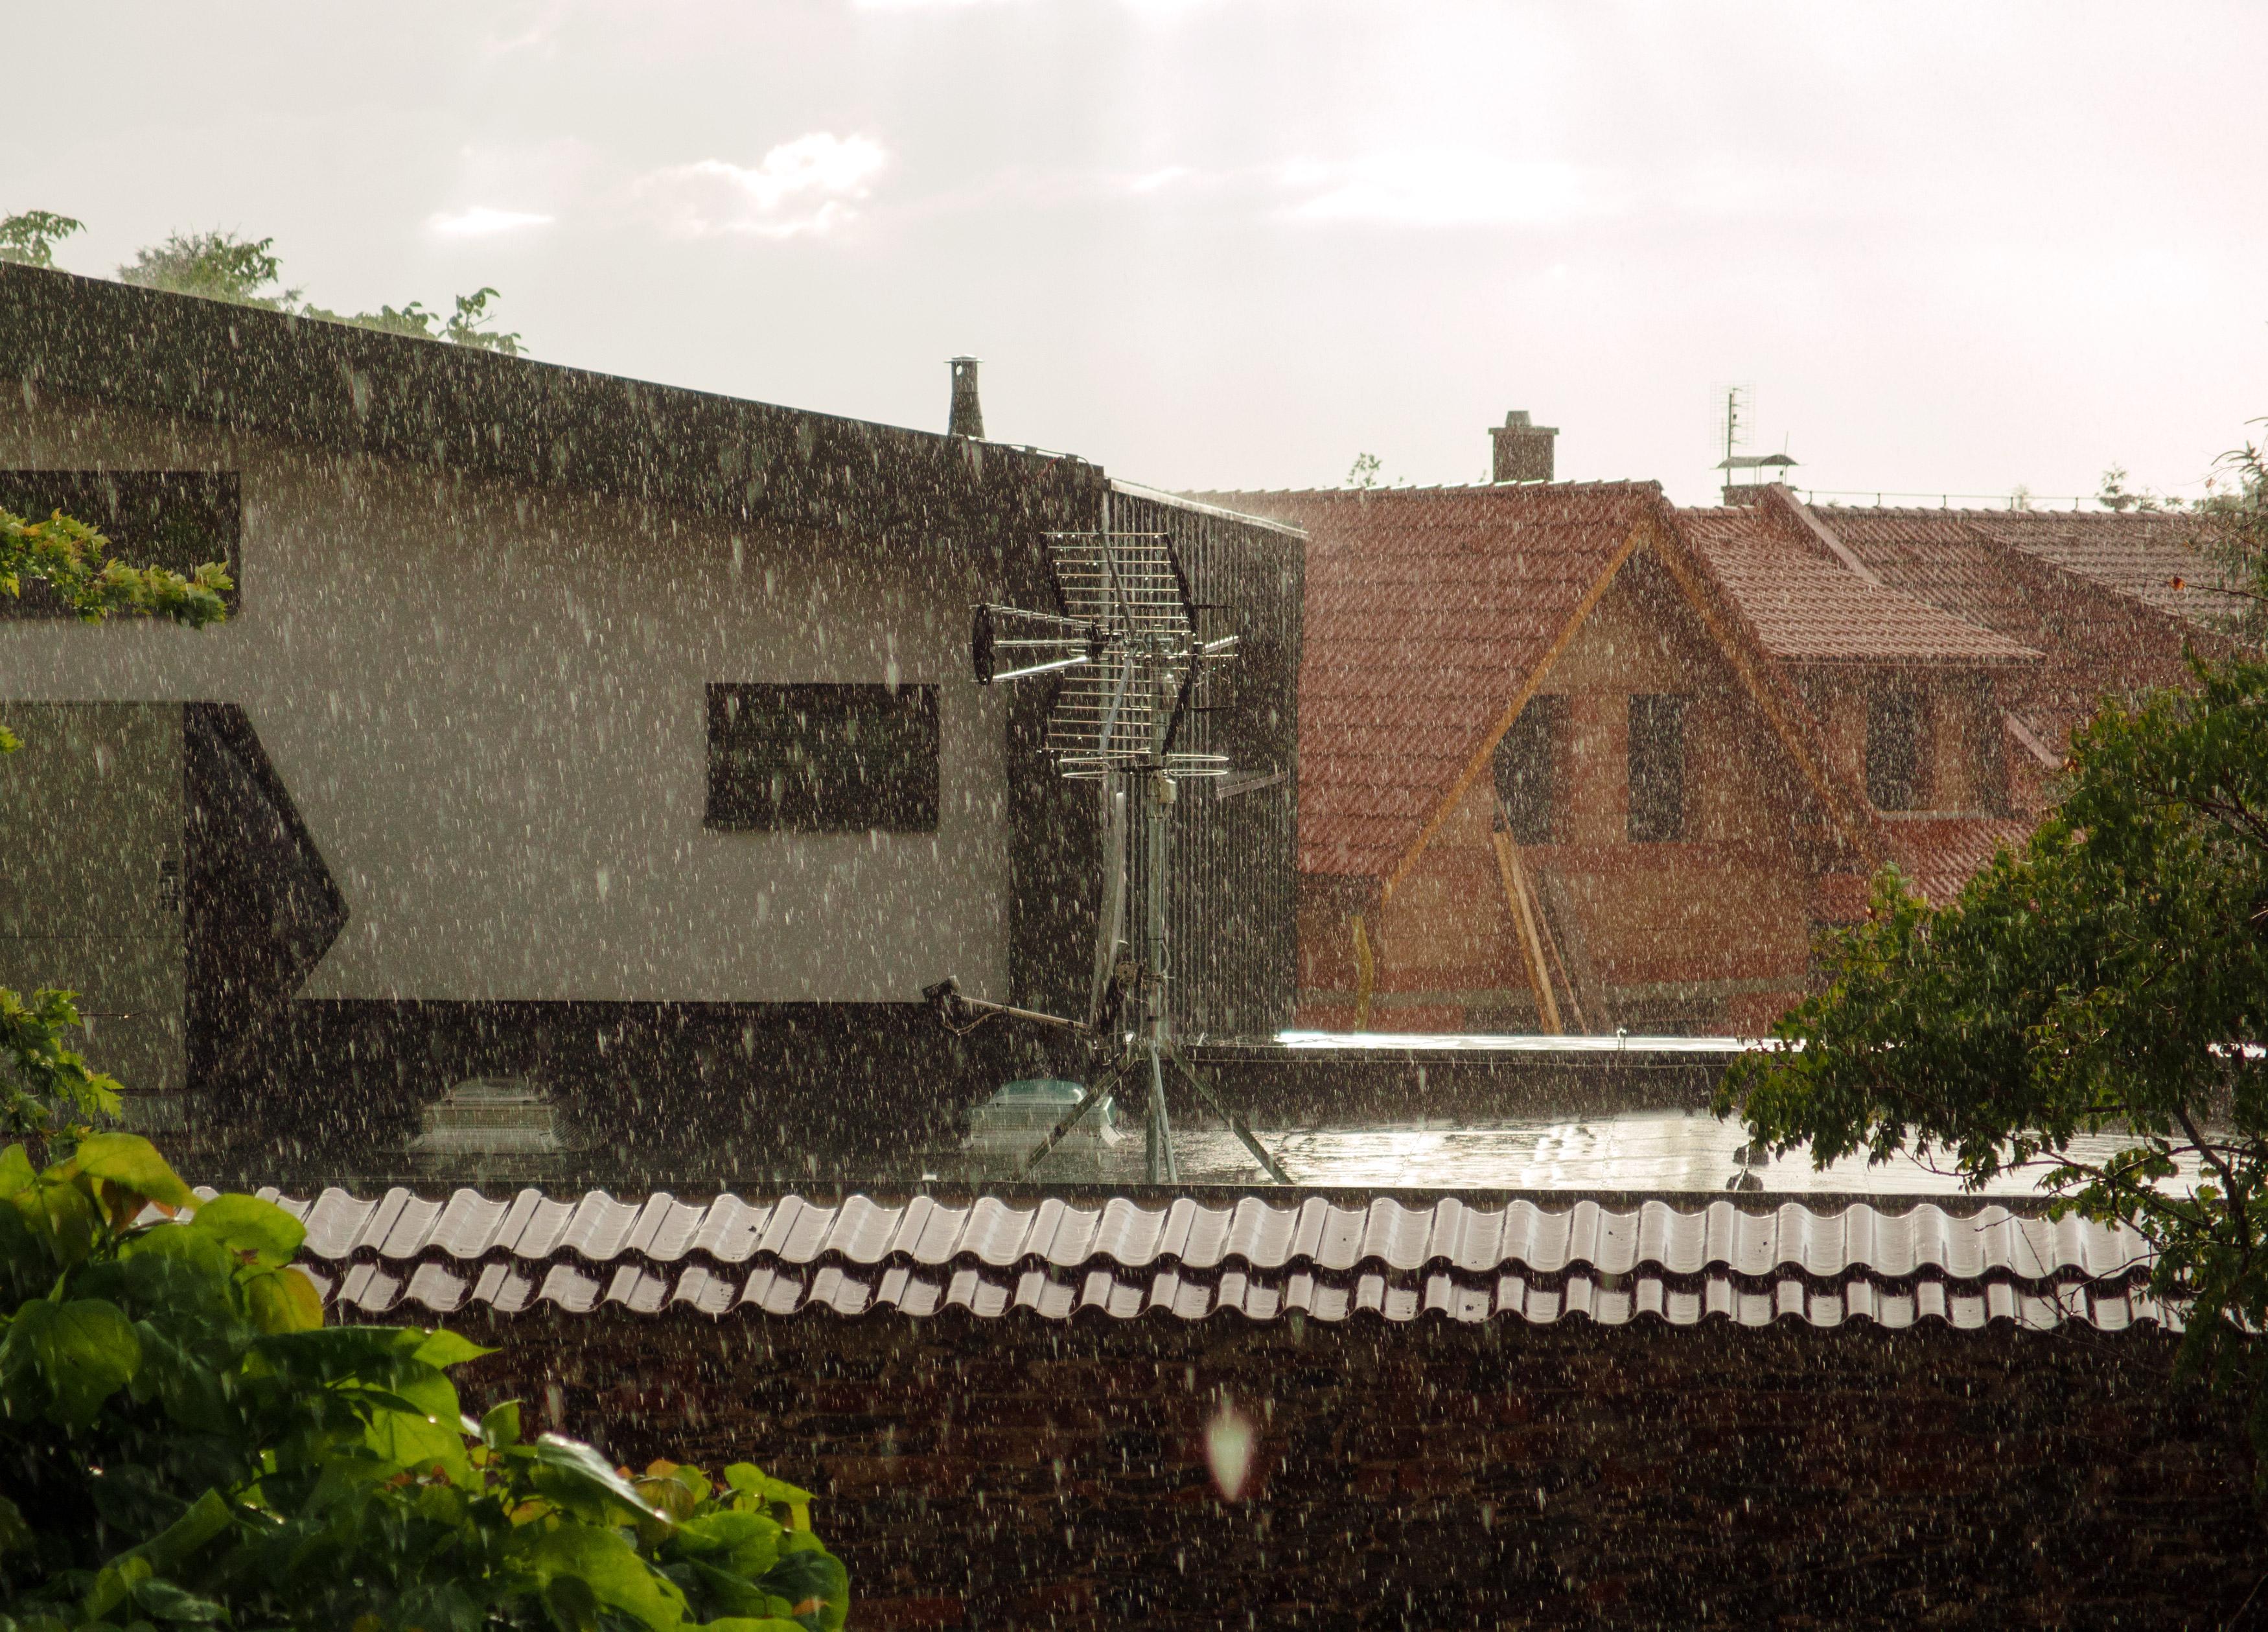 https://libreshot.com/wp-content/uploads/2017/04/rain-and-houses.jpg